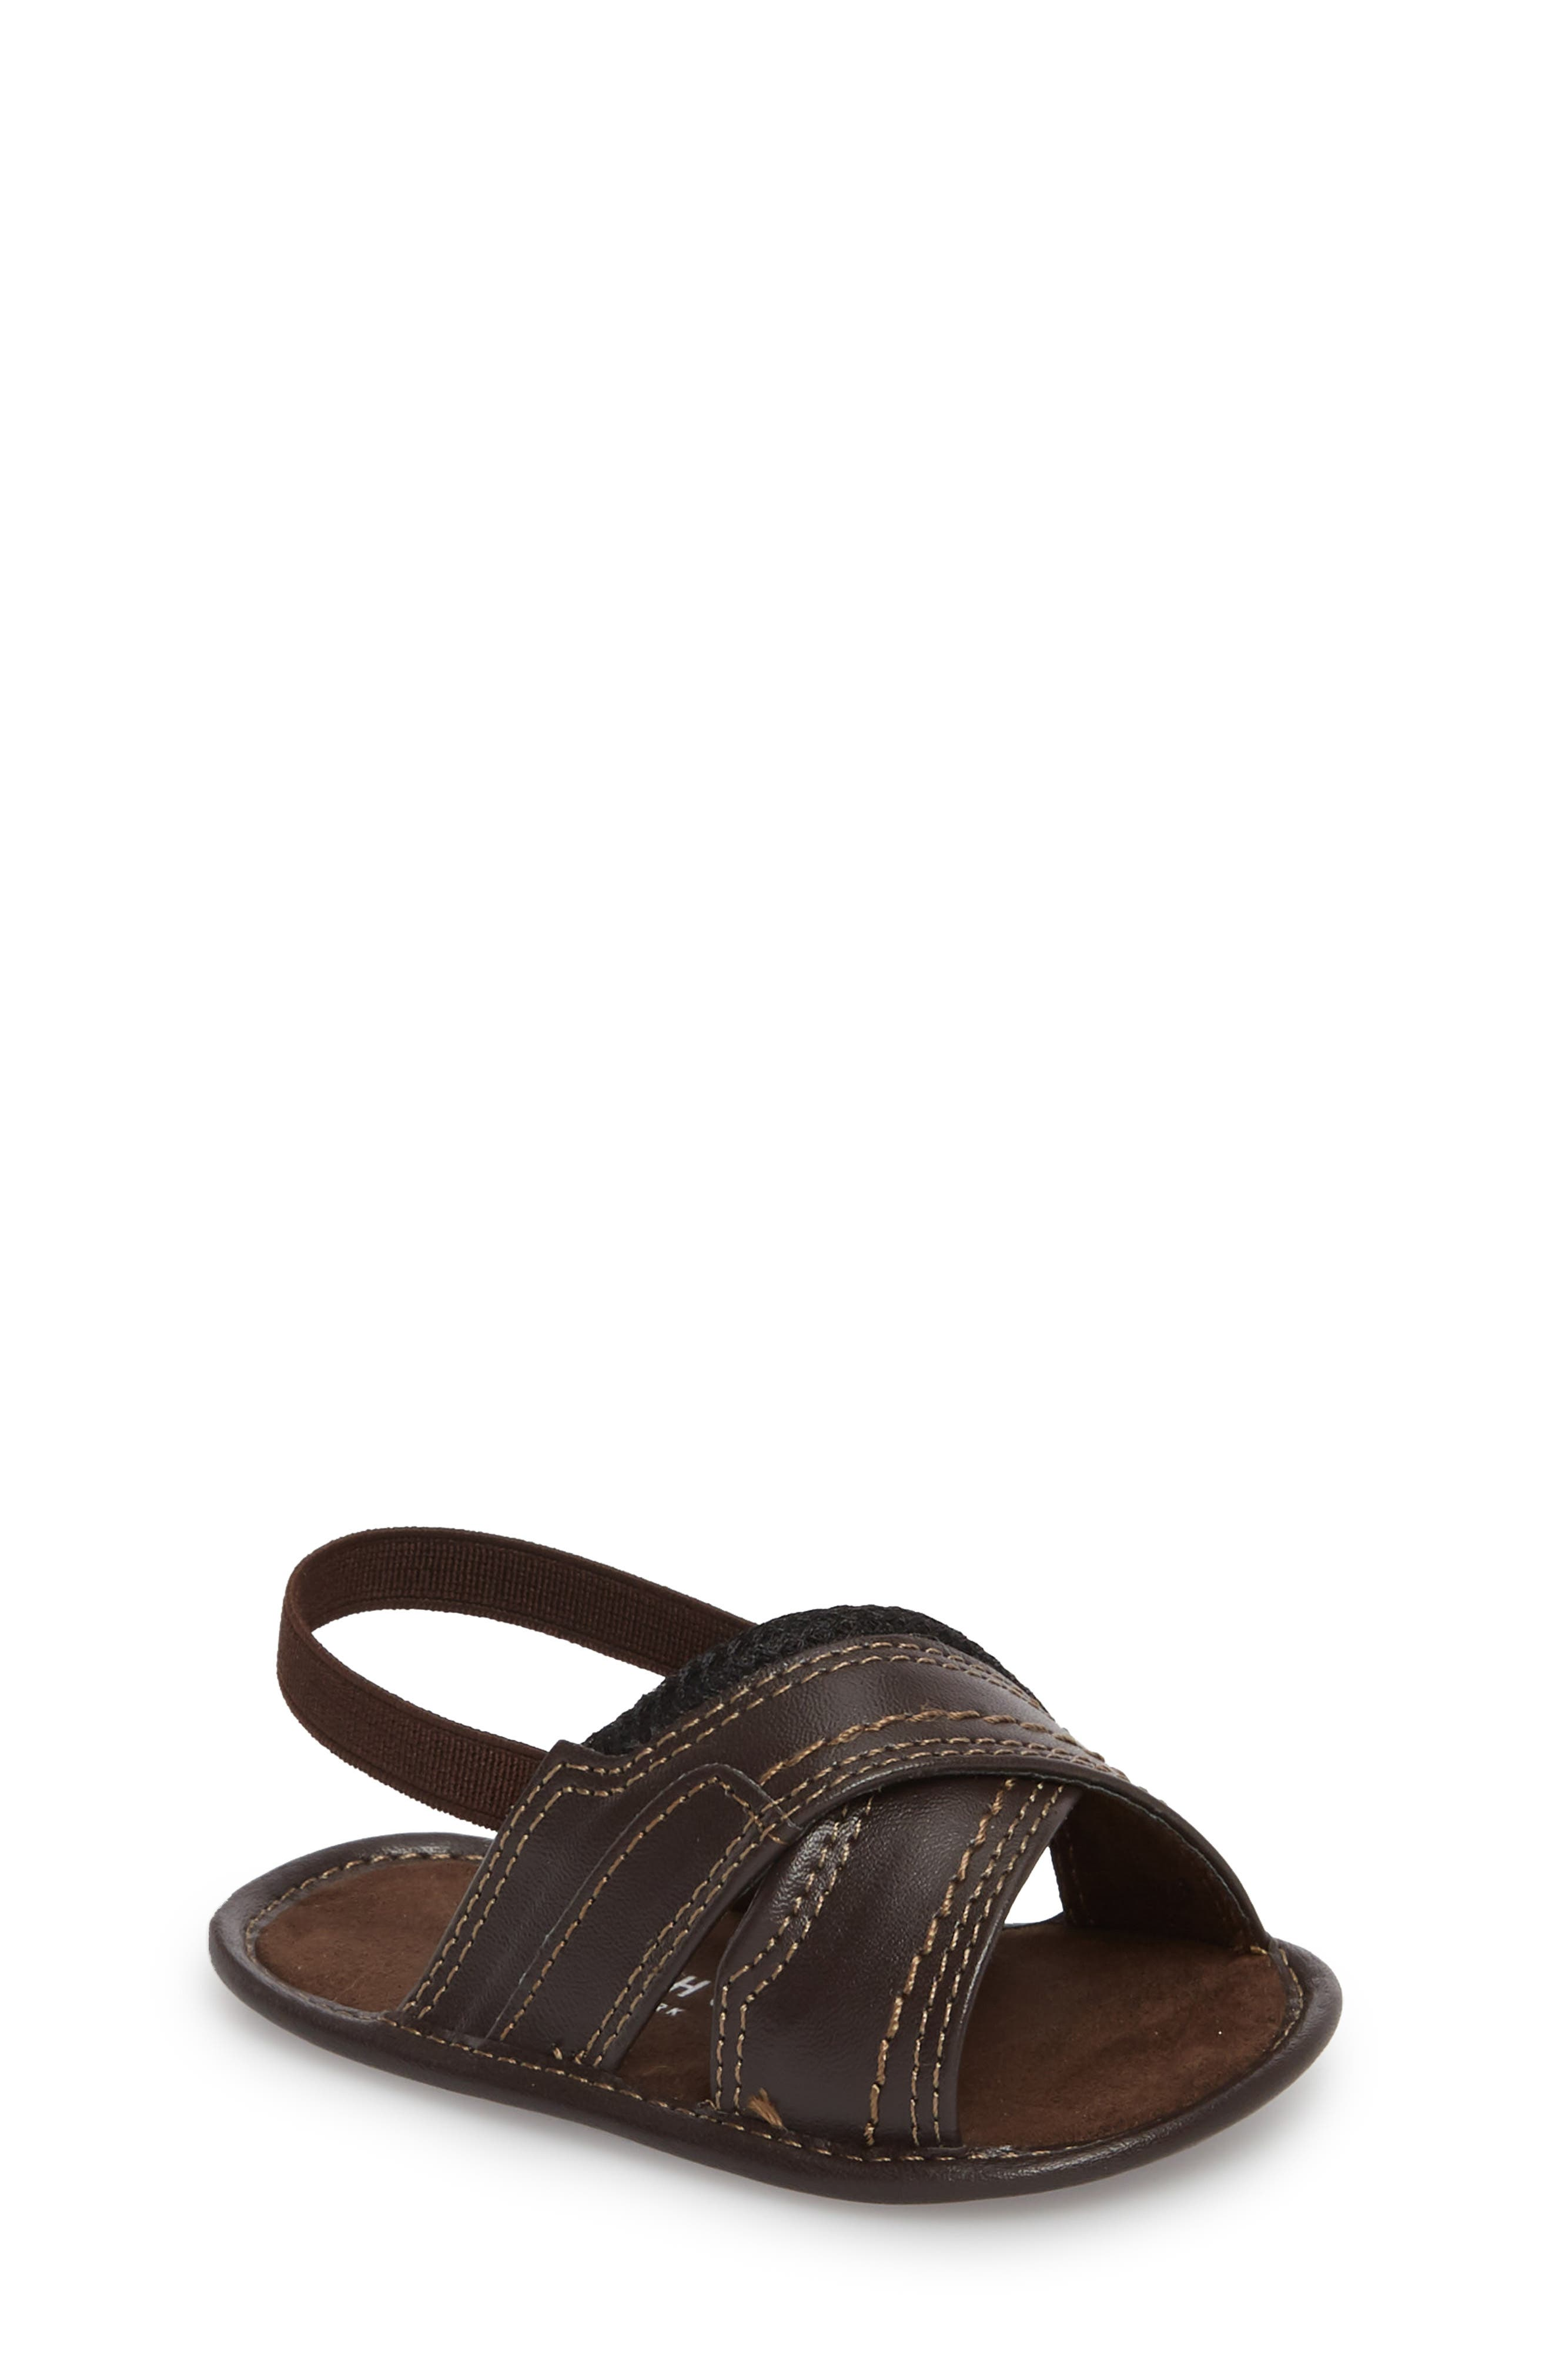 Kenneth Cole New York Leaf Sandal (Baby)